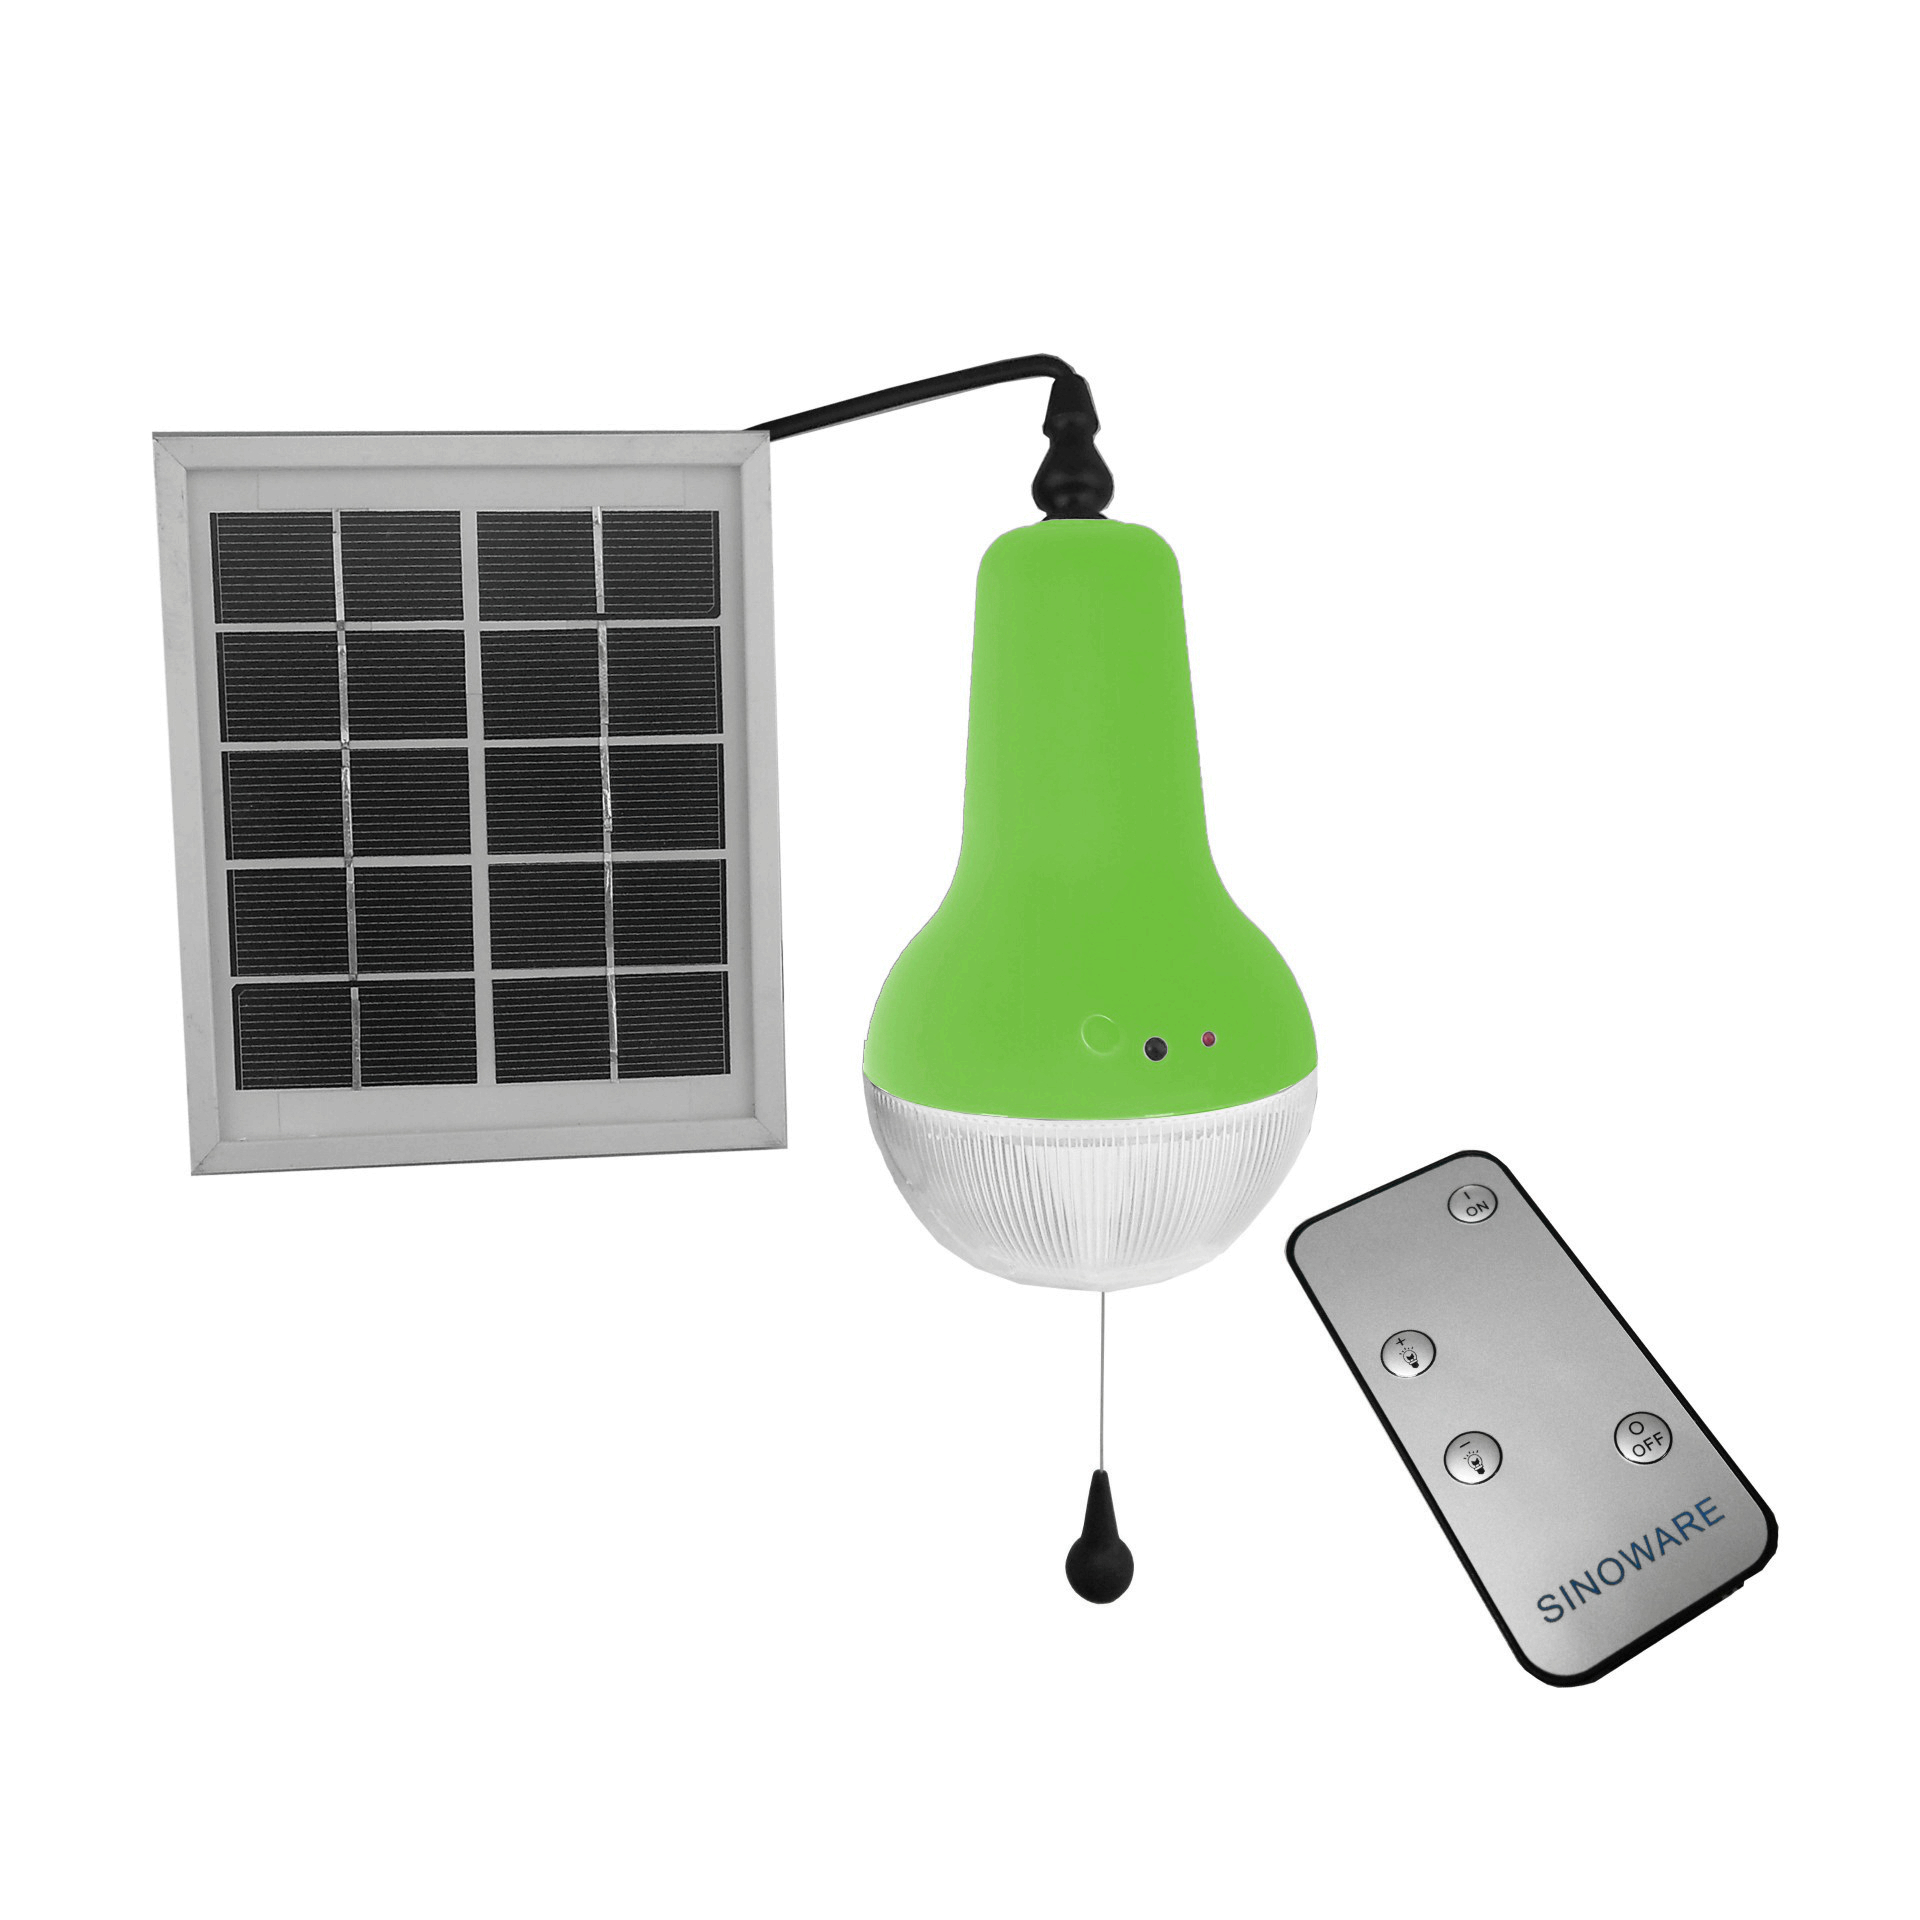 Professional China Supplier Remote Control Solar Lantern Super Bright Solar Lamp Solar Emergency Light Green